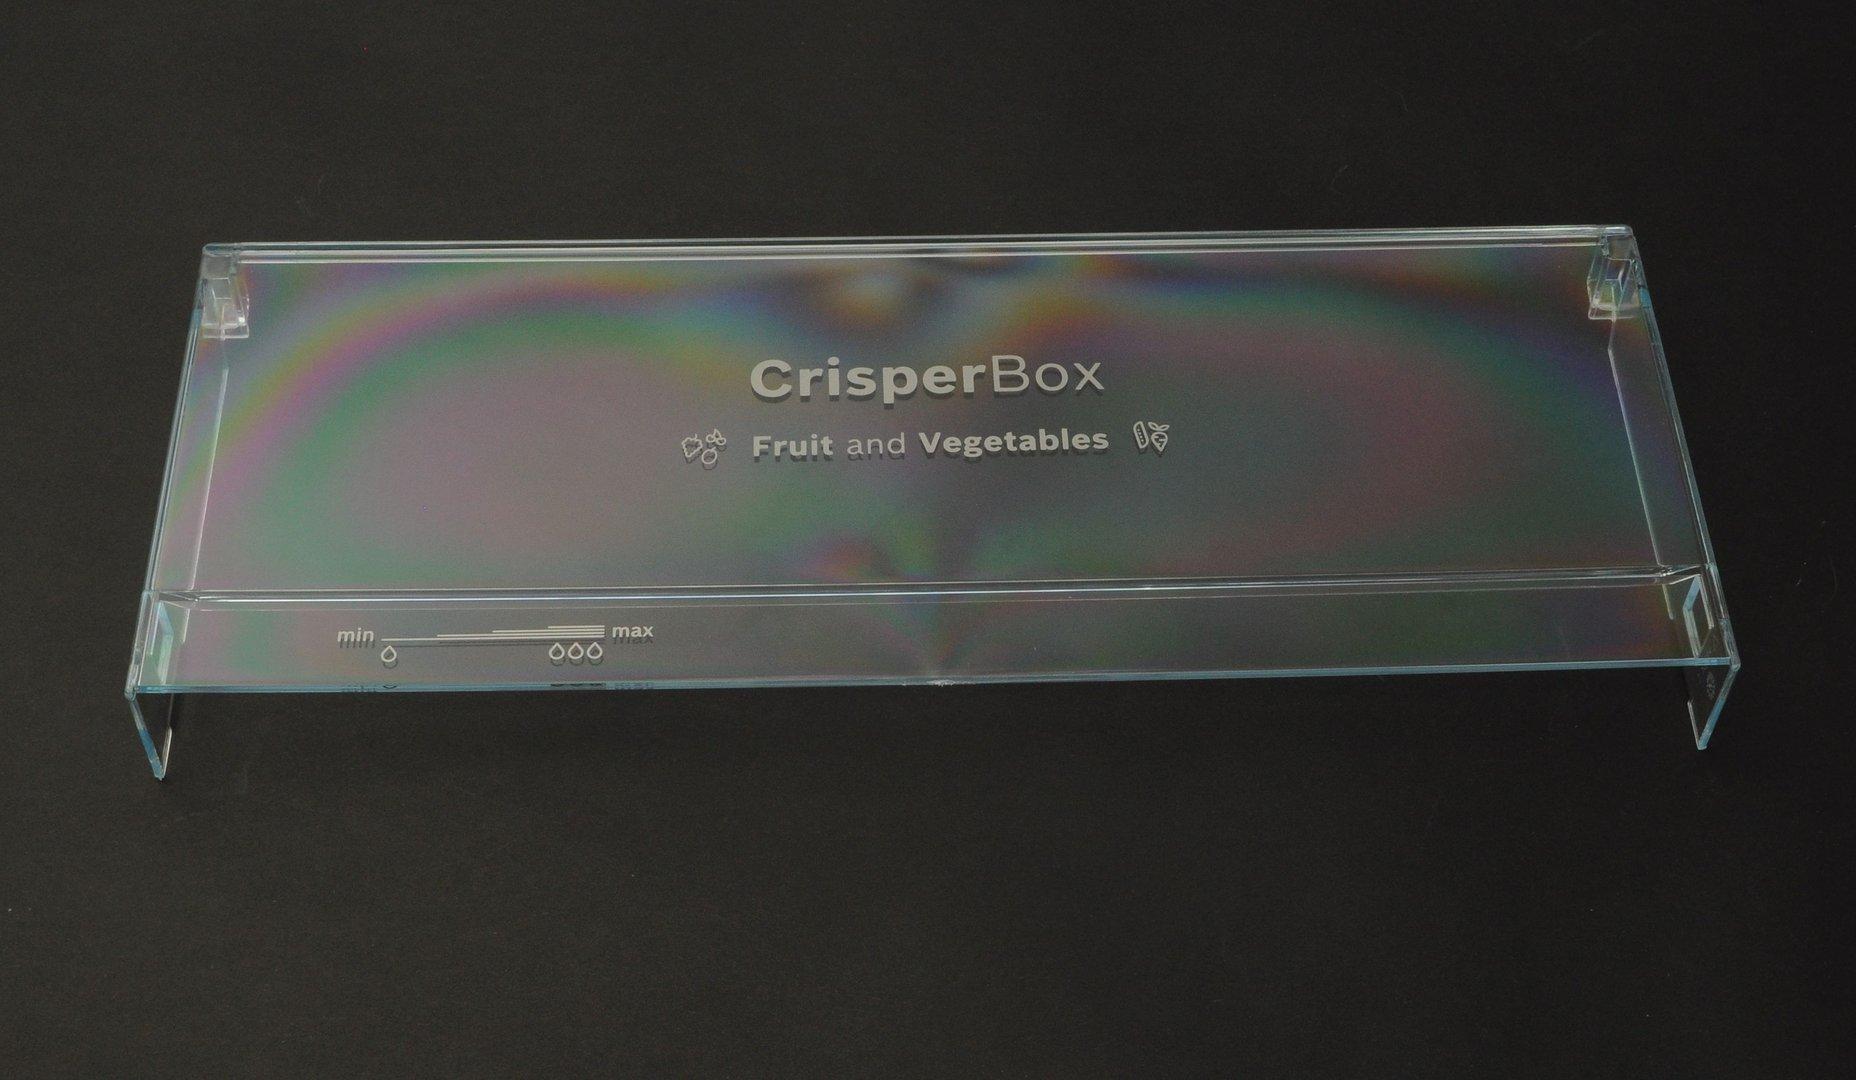 Bosch Kühlschrank Crisper Box : Bosch siemens vorder wand gemüse für schale schublade crisper box